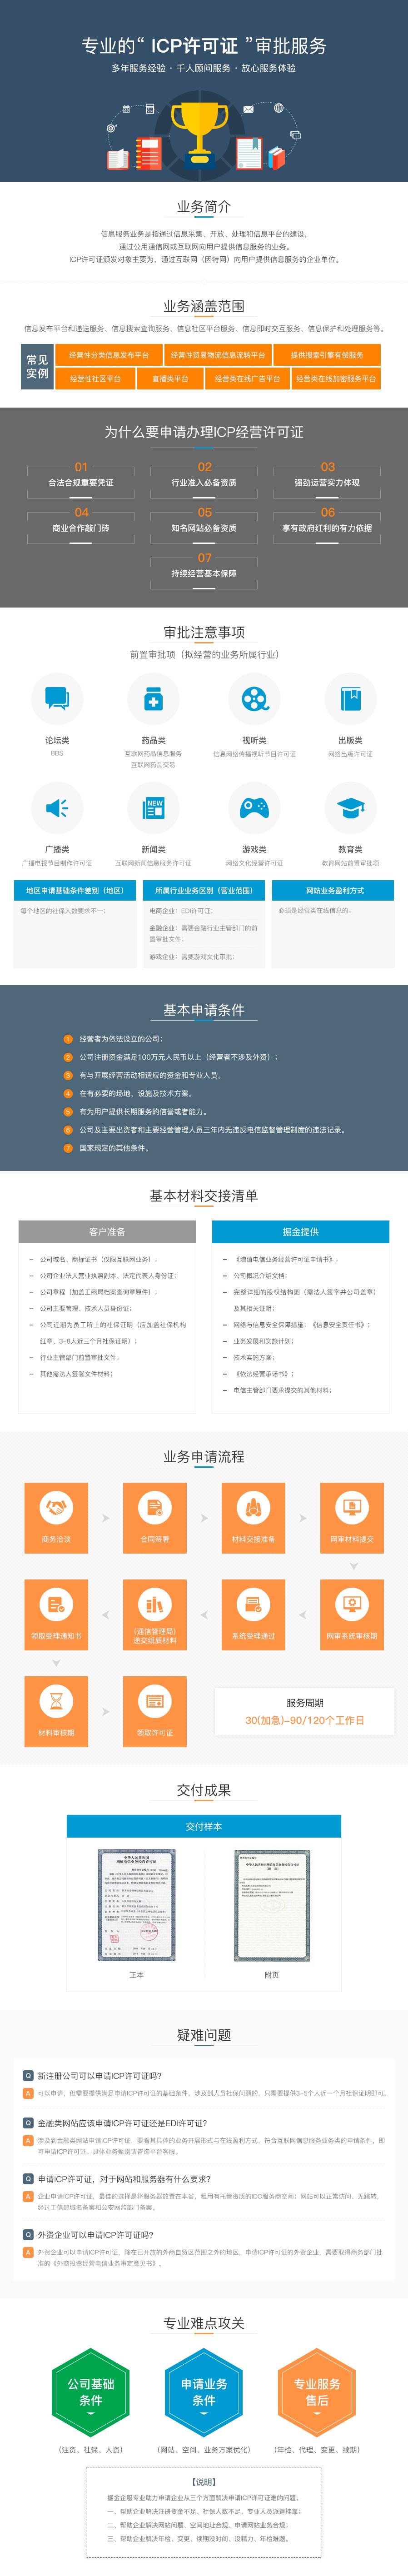 ICP許可證辦理資料,ICP許可證辦理流程